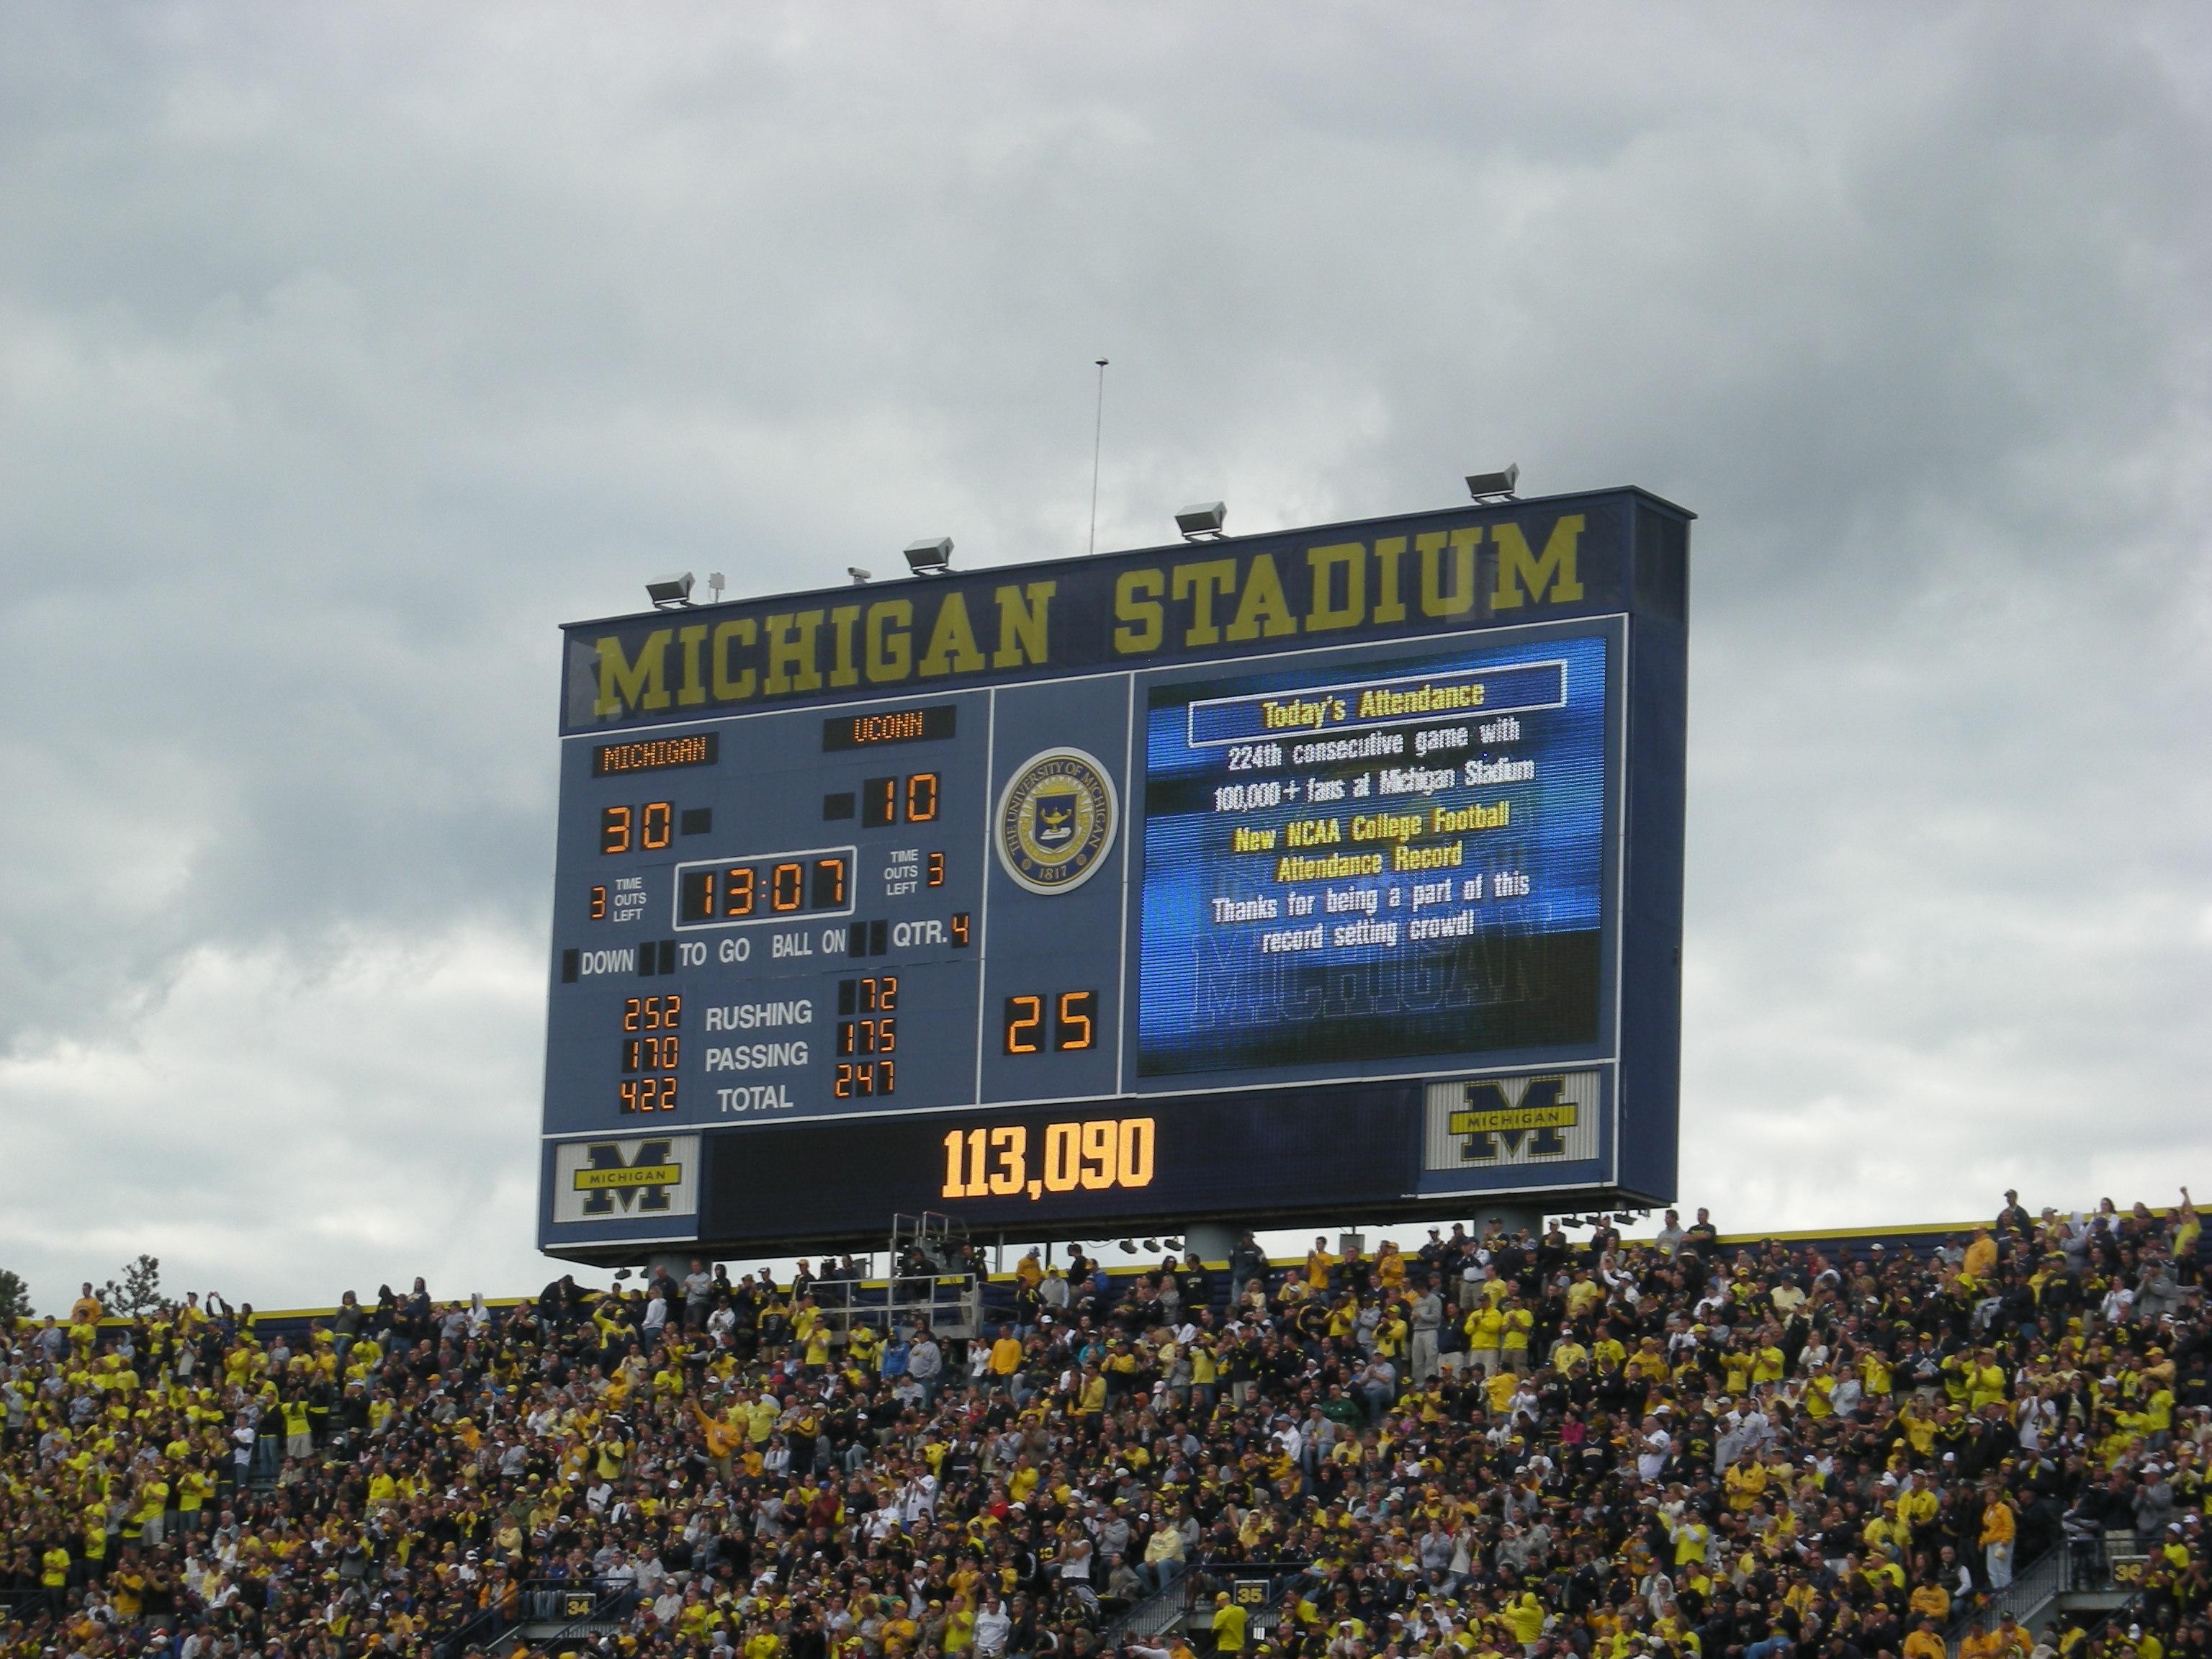 New Michigan Stadium Scoreboard